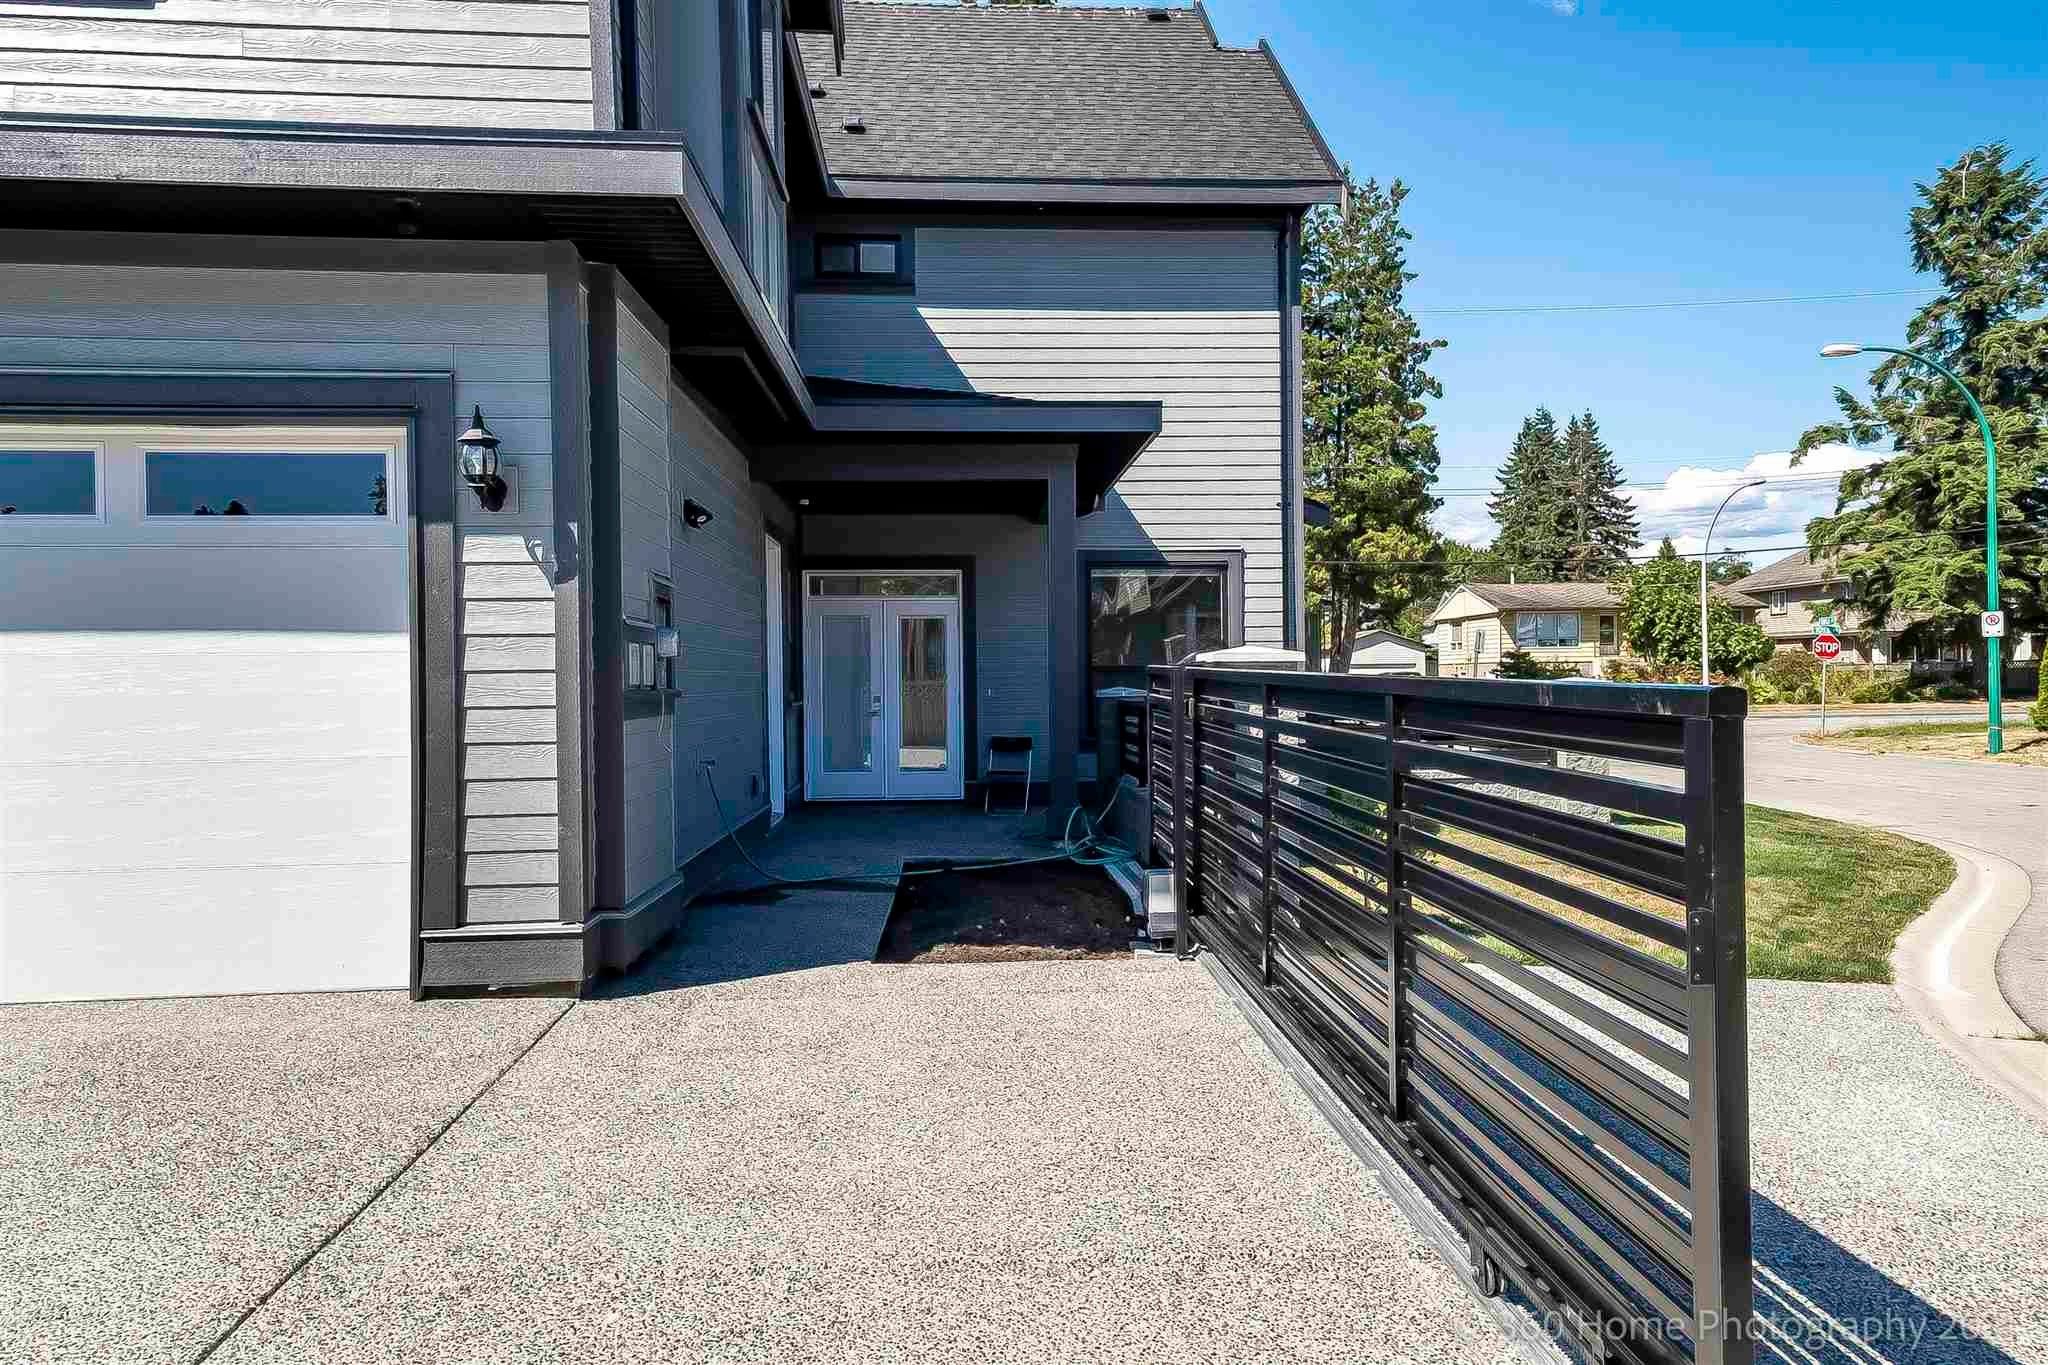 13050 101B AVENUE - Cedar Hills House/Single Family for sale, 5 Bedrooms (R2602208) - #5